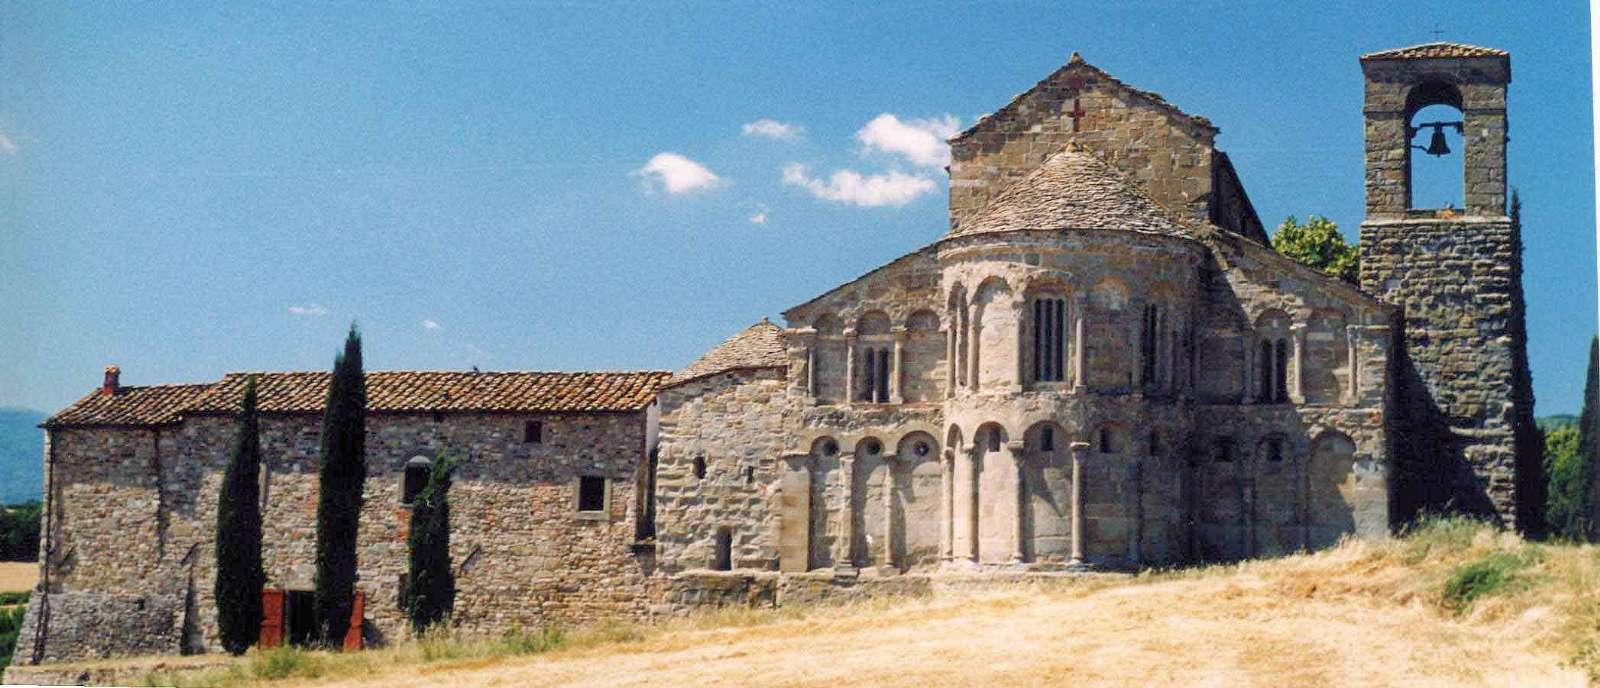 Romena kloster